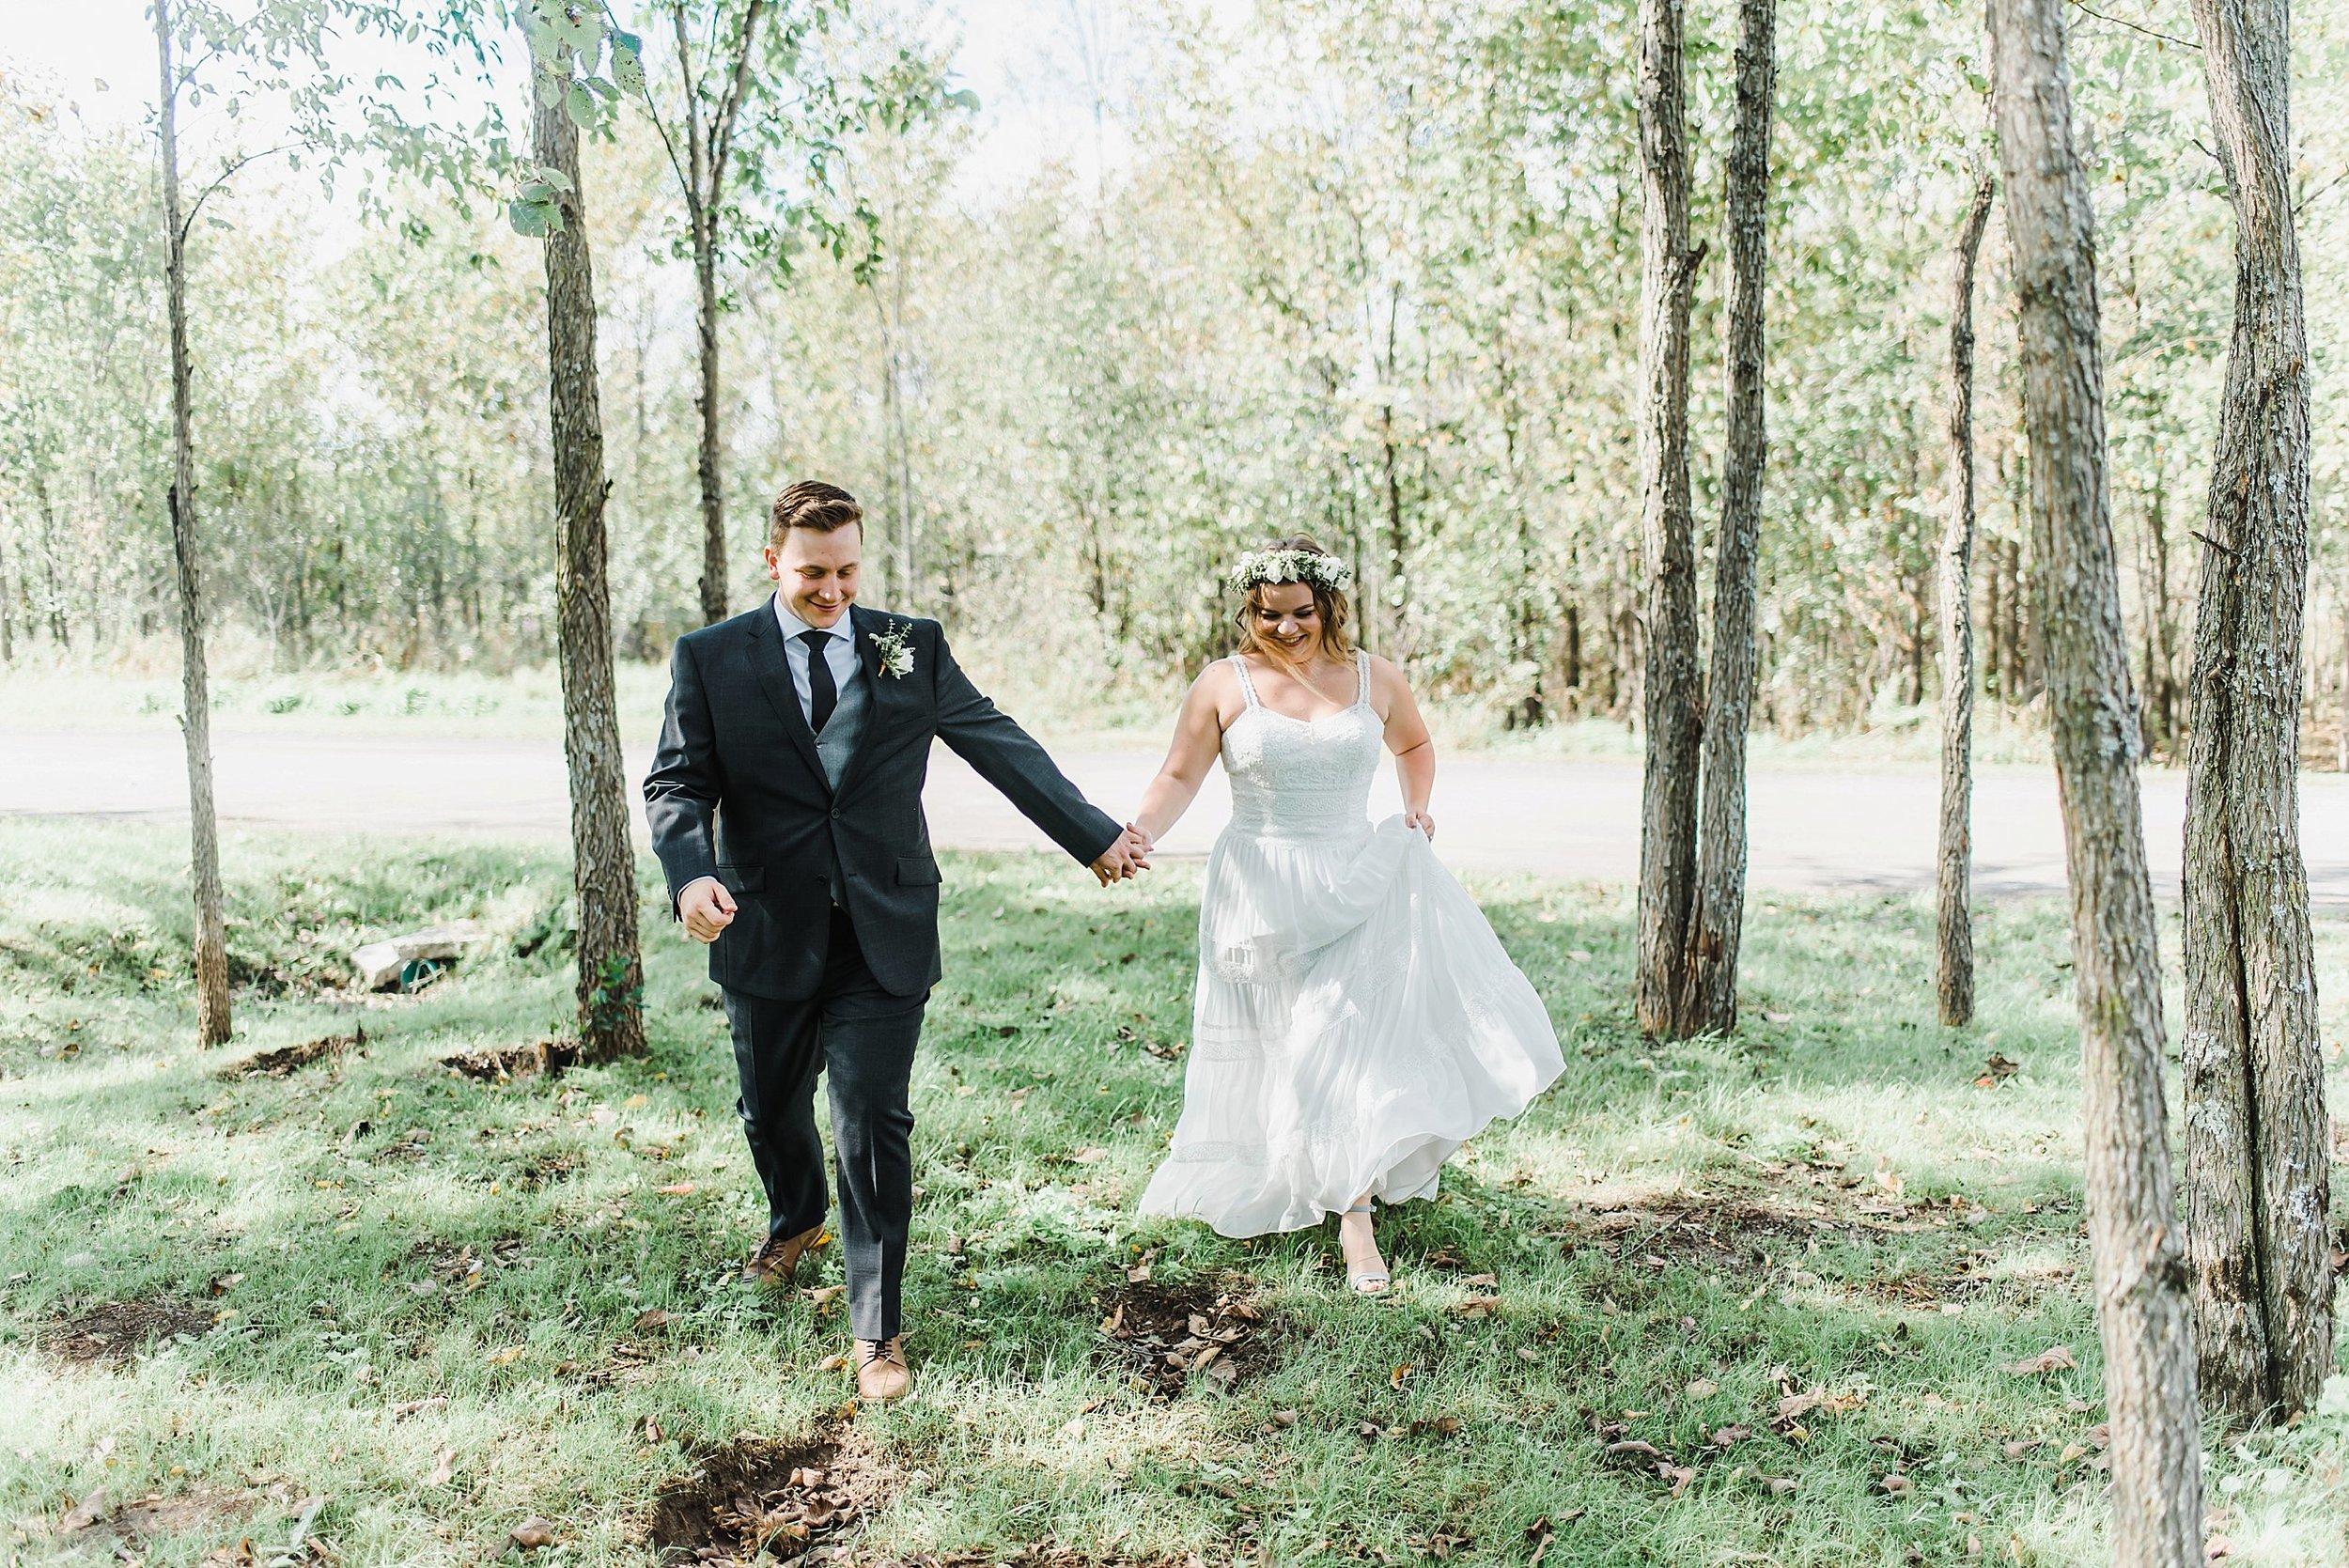 light airy indie fine art ottawa wedding photographer | Ali and Batoul Photography_1110.jpg